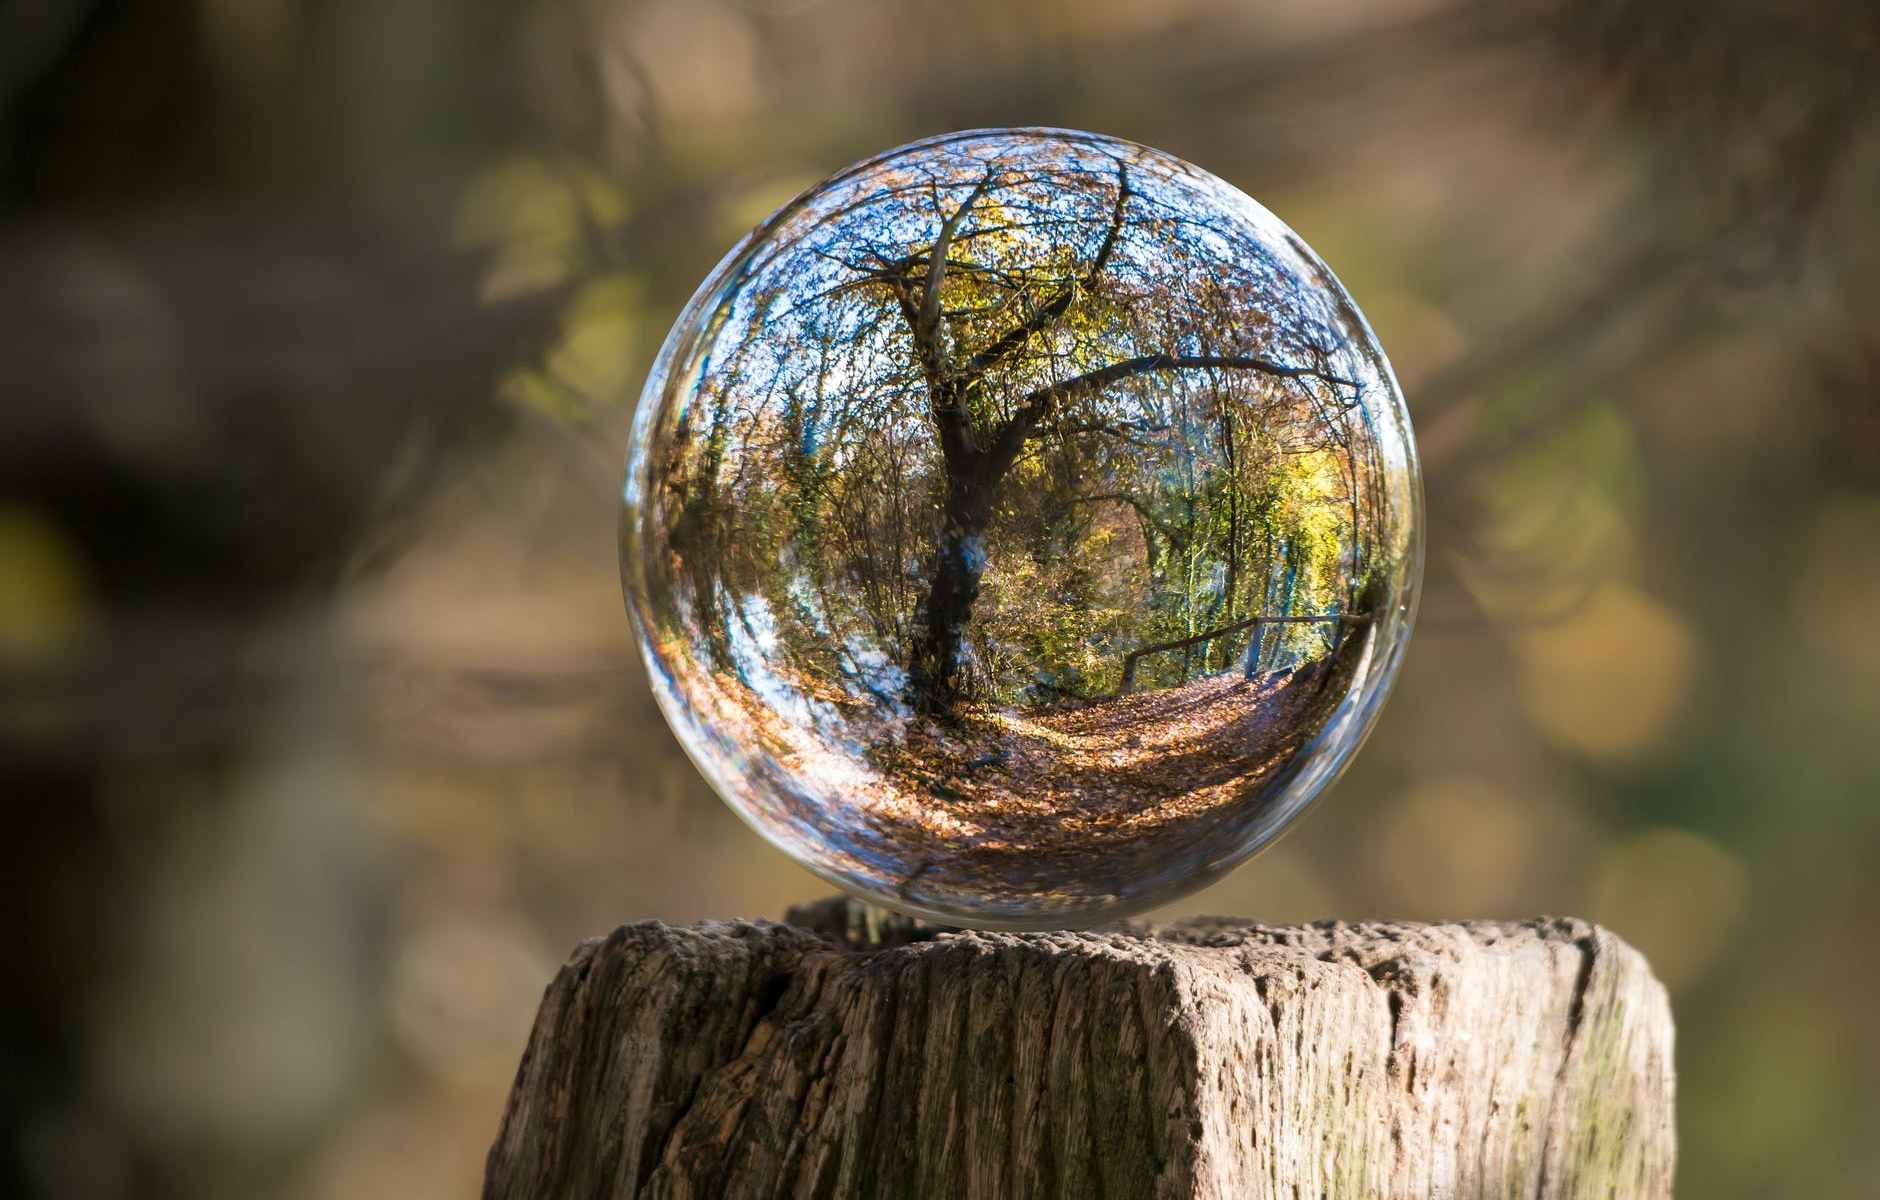 macro photography of tree